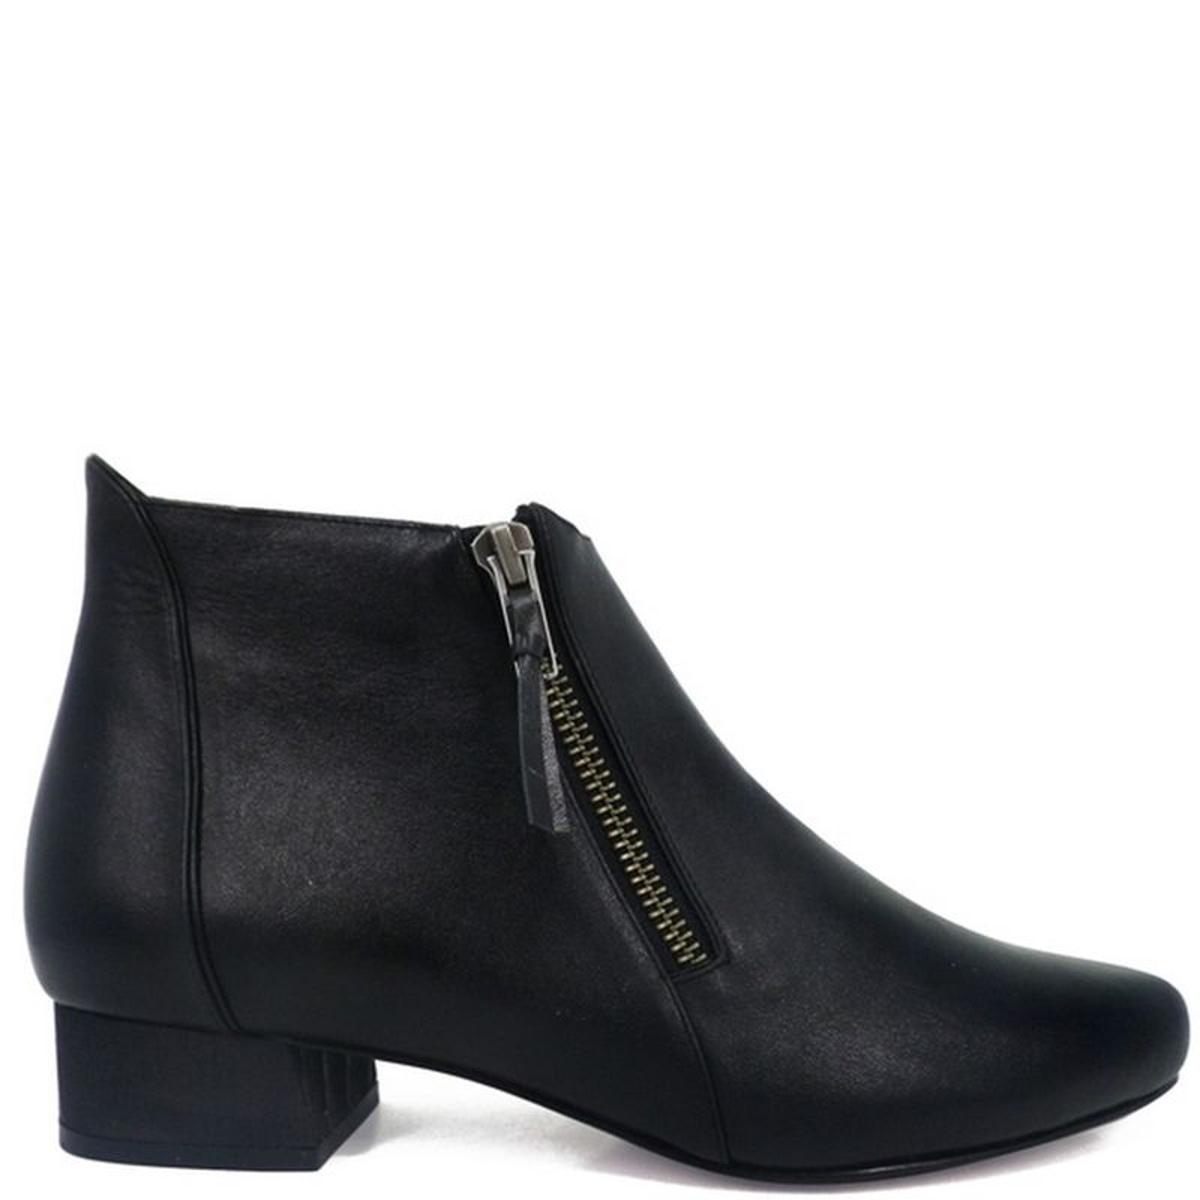 Chaussures femme en cuir LORI BOOTS Grey